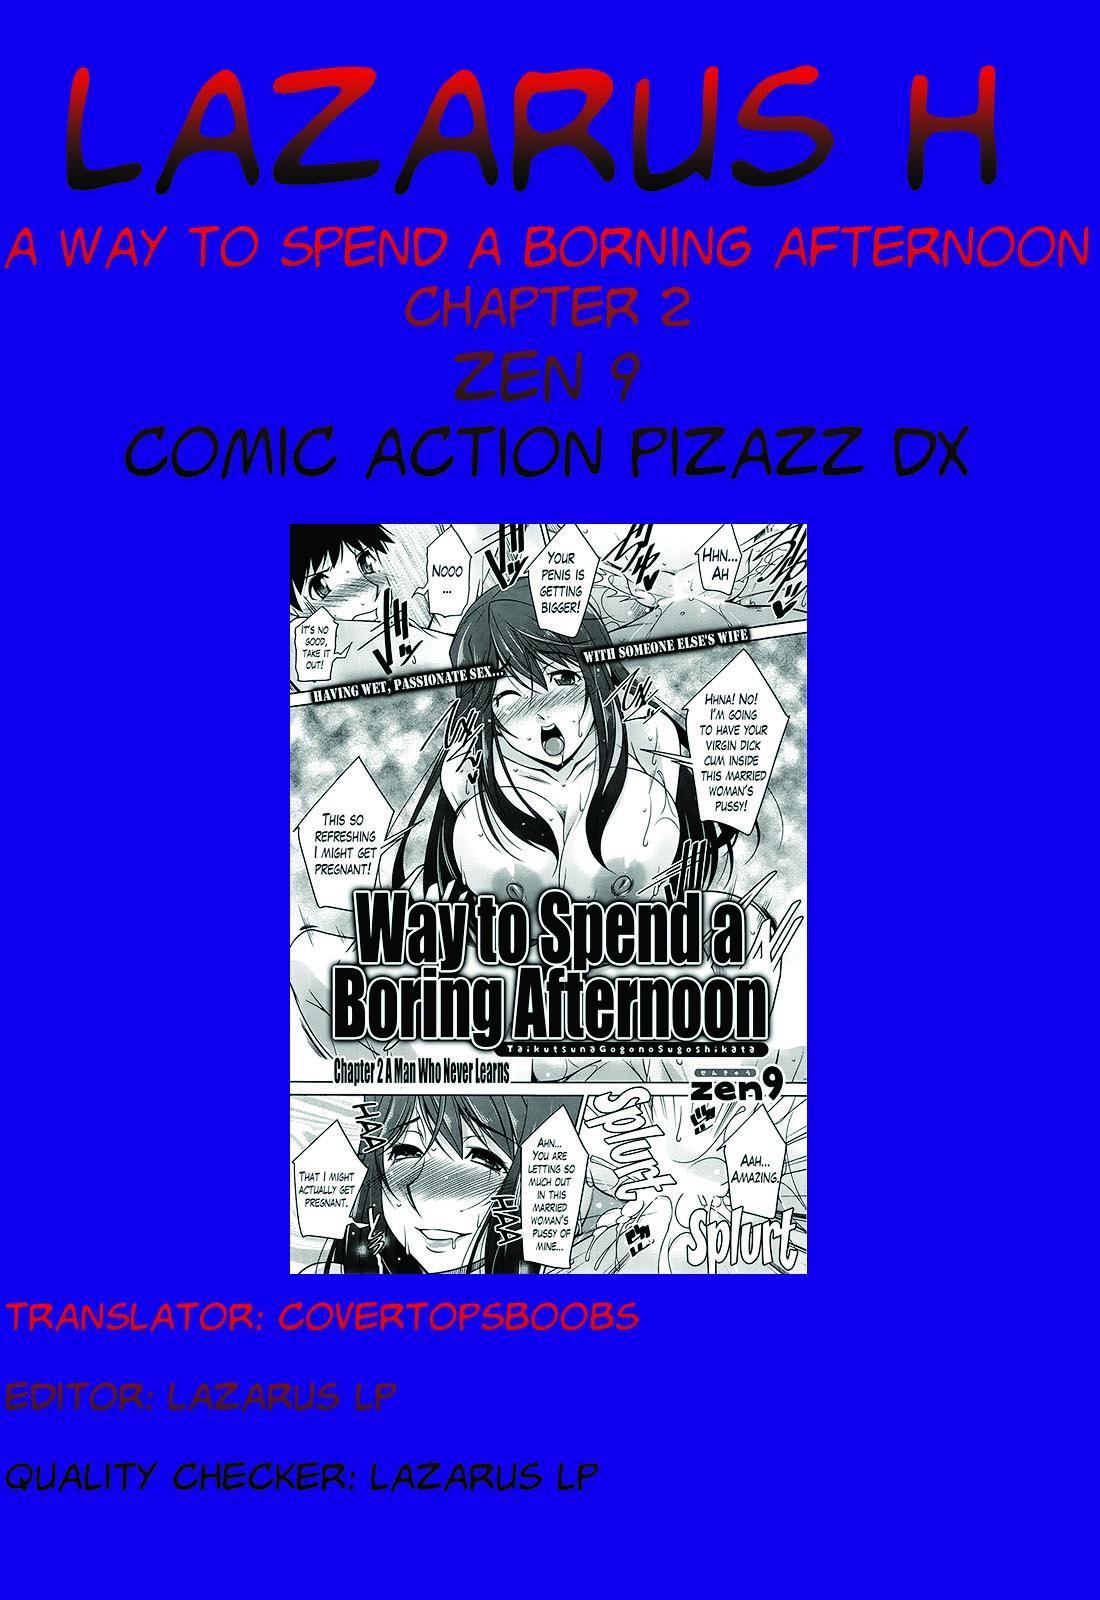 [Zen9] Taikutsu na Gogo no Sugoshikata Ch. 1-5   A Way to Spend a Boring Afternoon Ch. 1-5 (Action Pizazz DX 2013-12) [English](hentai2read.com)[Lazarus H] 38